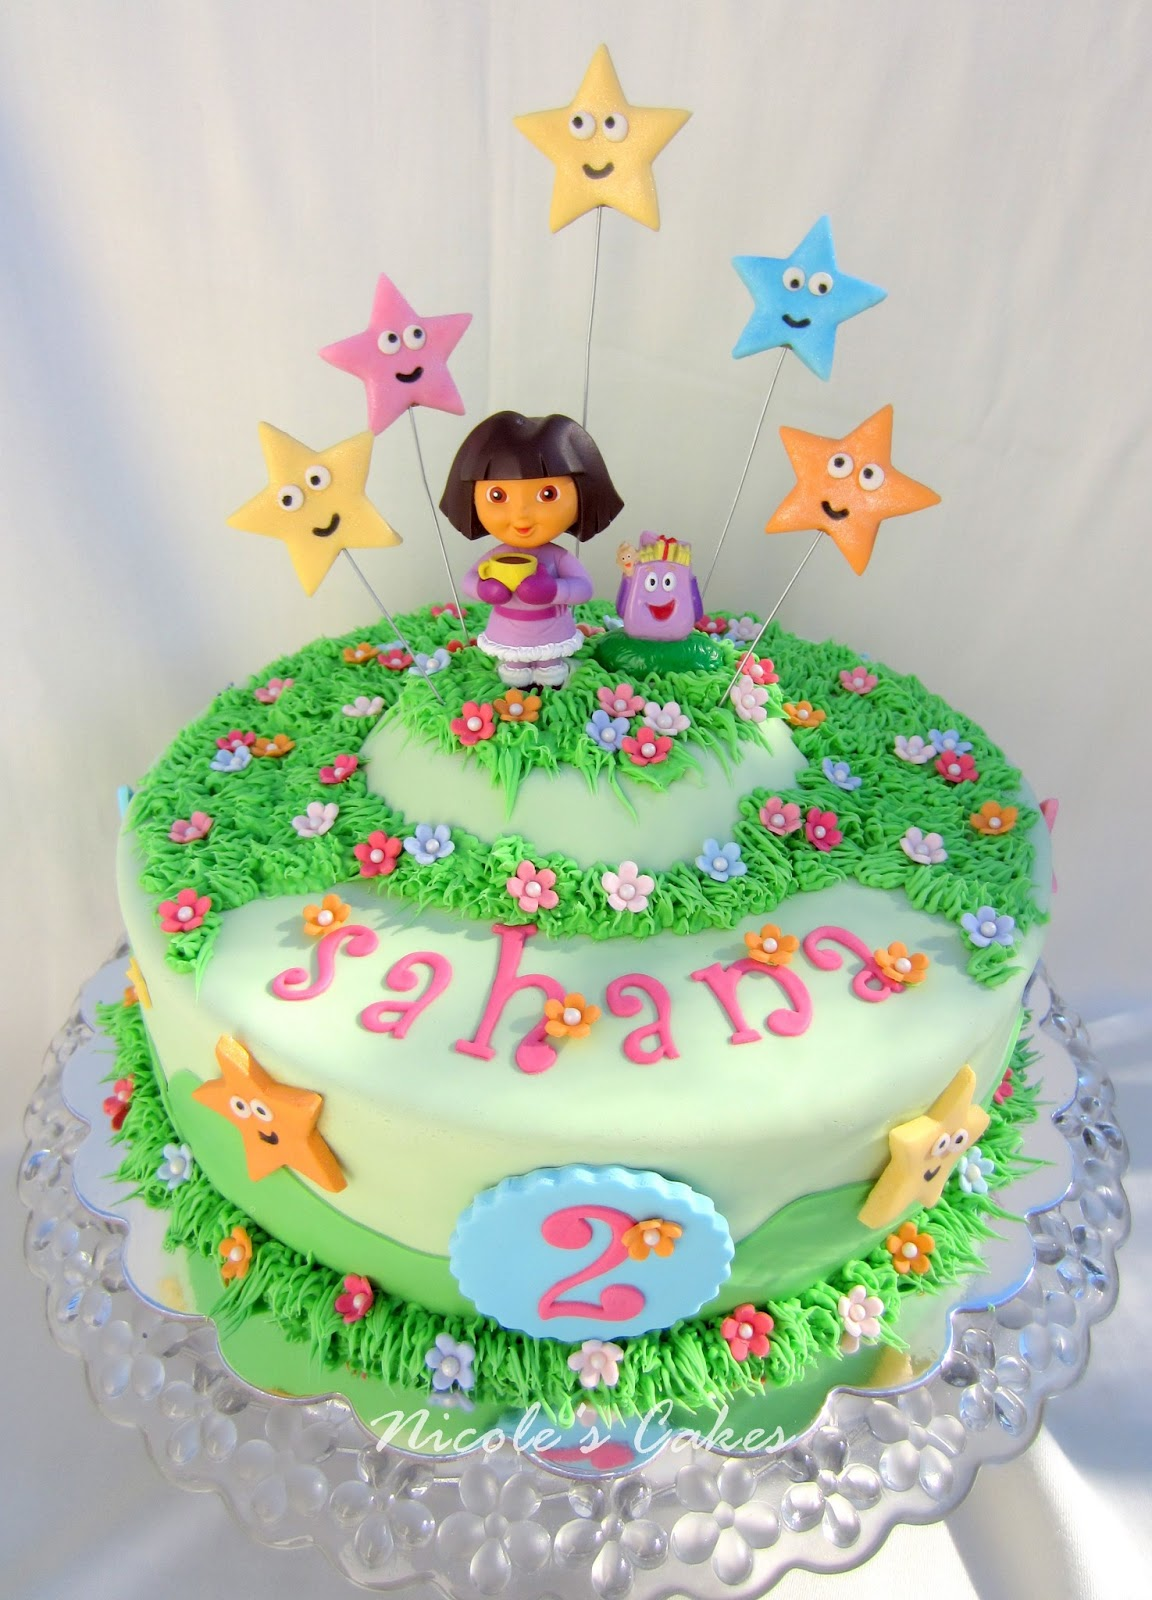 Confections Cakes Amp Creations Dora The Explorer